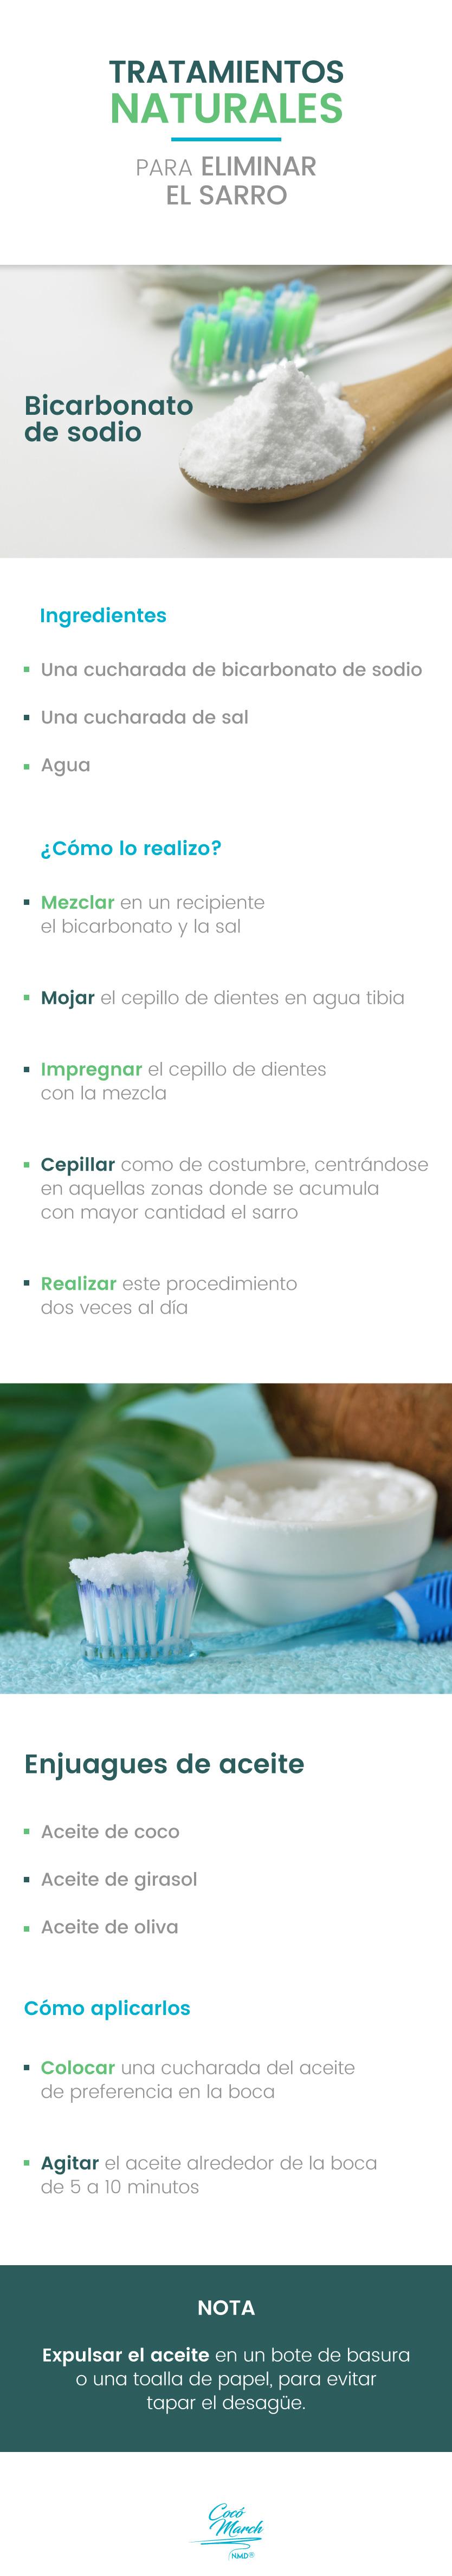 remedios-naturales-para-el-sarro